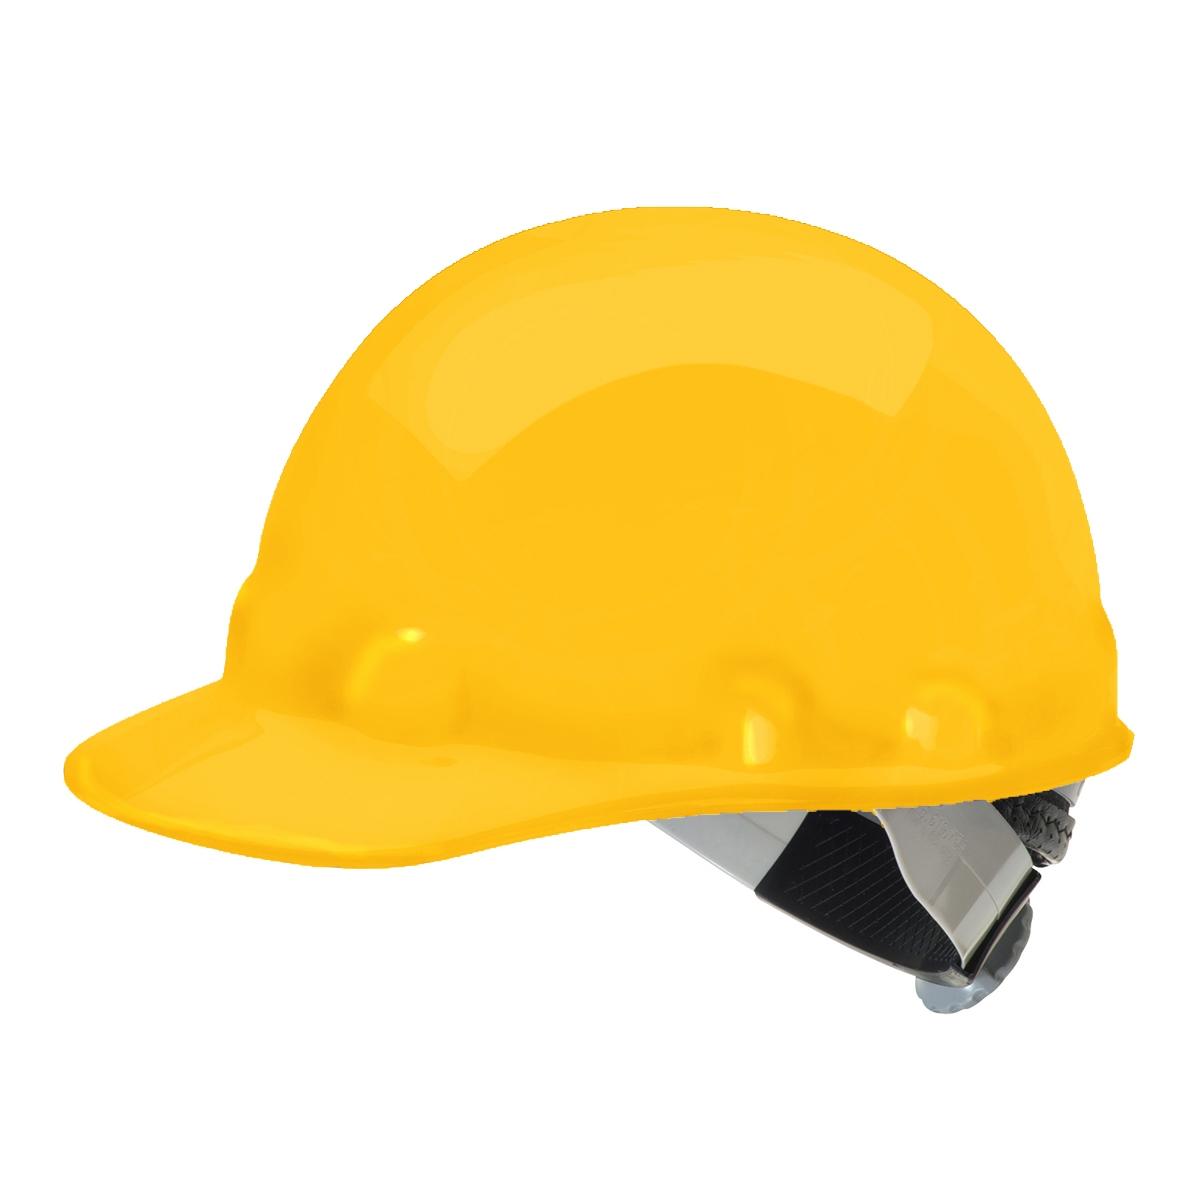 fibre metal e2sw hard hat swingstrap suspension yellow. Black Bedroom Furniture Sets. Home Design Ideas